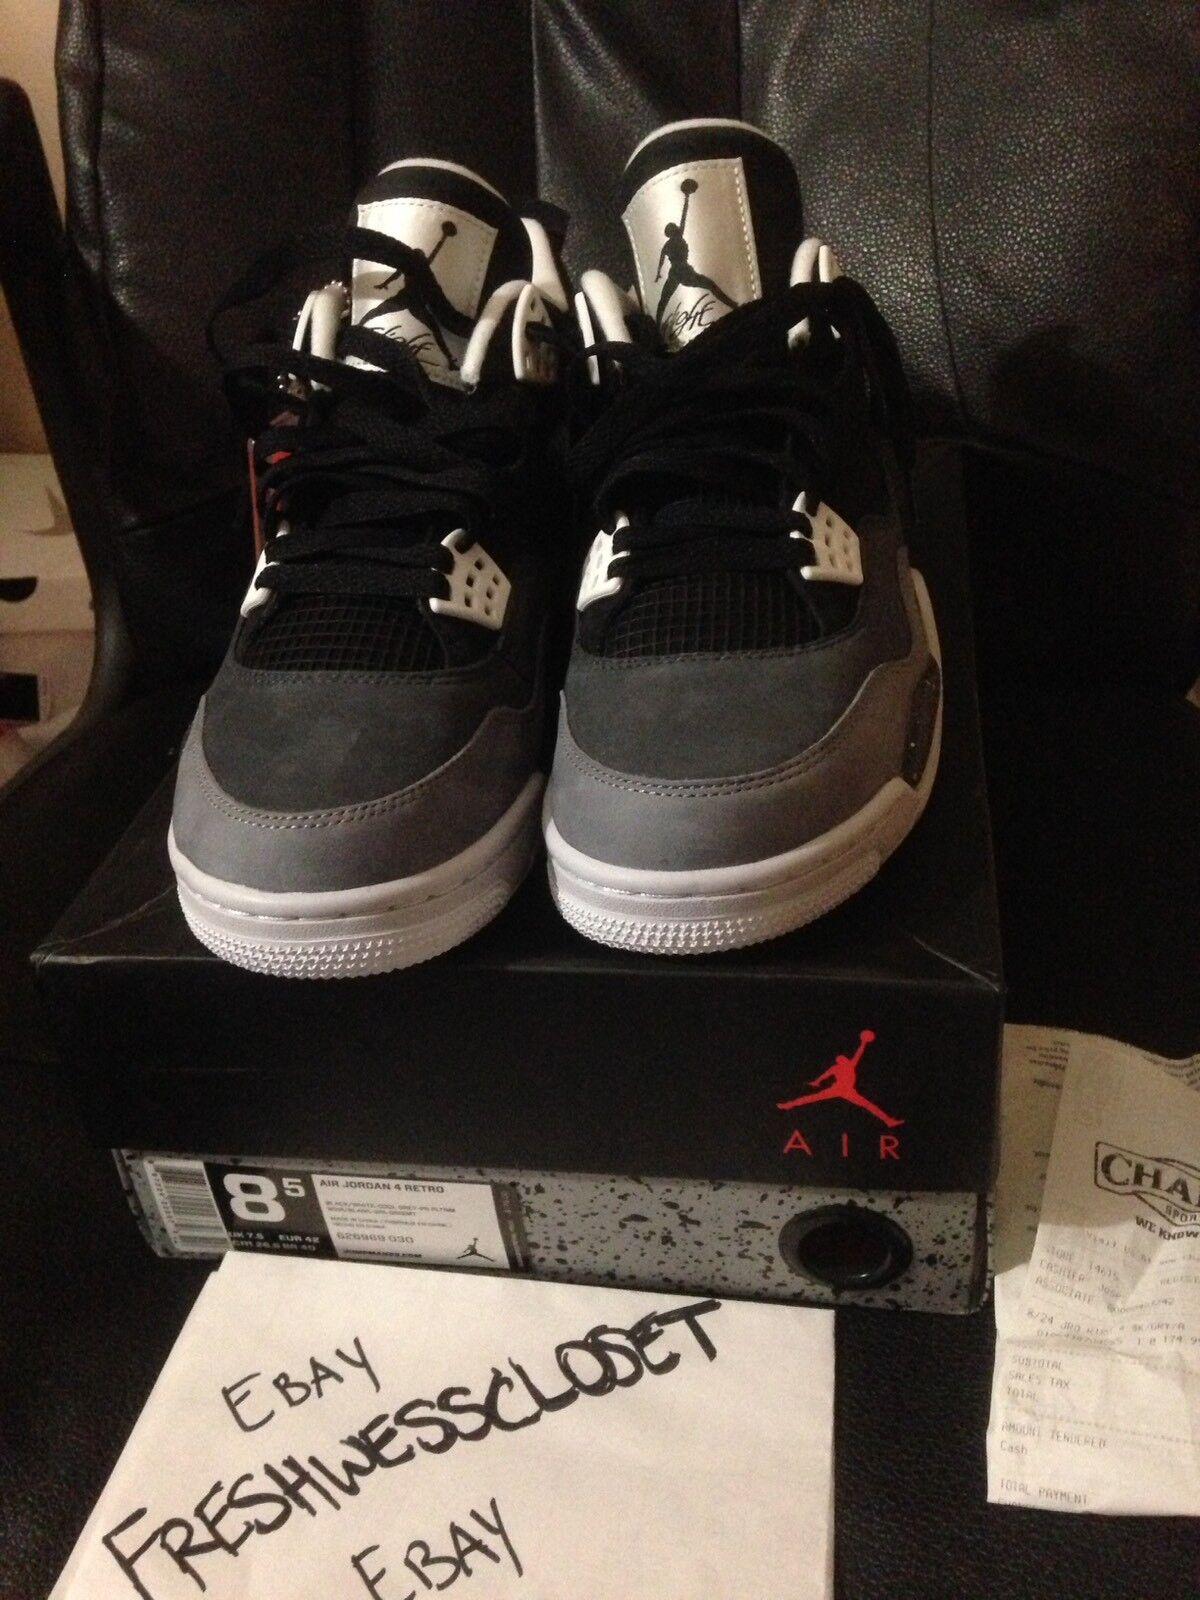 2018 DS Nike Air Jordan 4 Retro Fear 8.5 pack 11 1 5 6 7 8 3 bred chicago toro